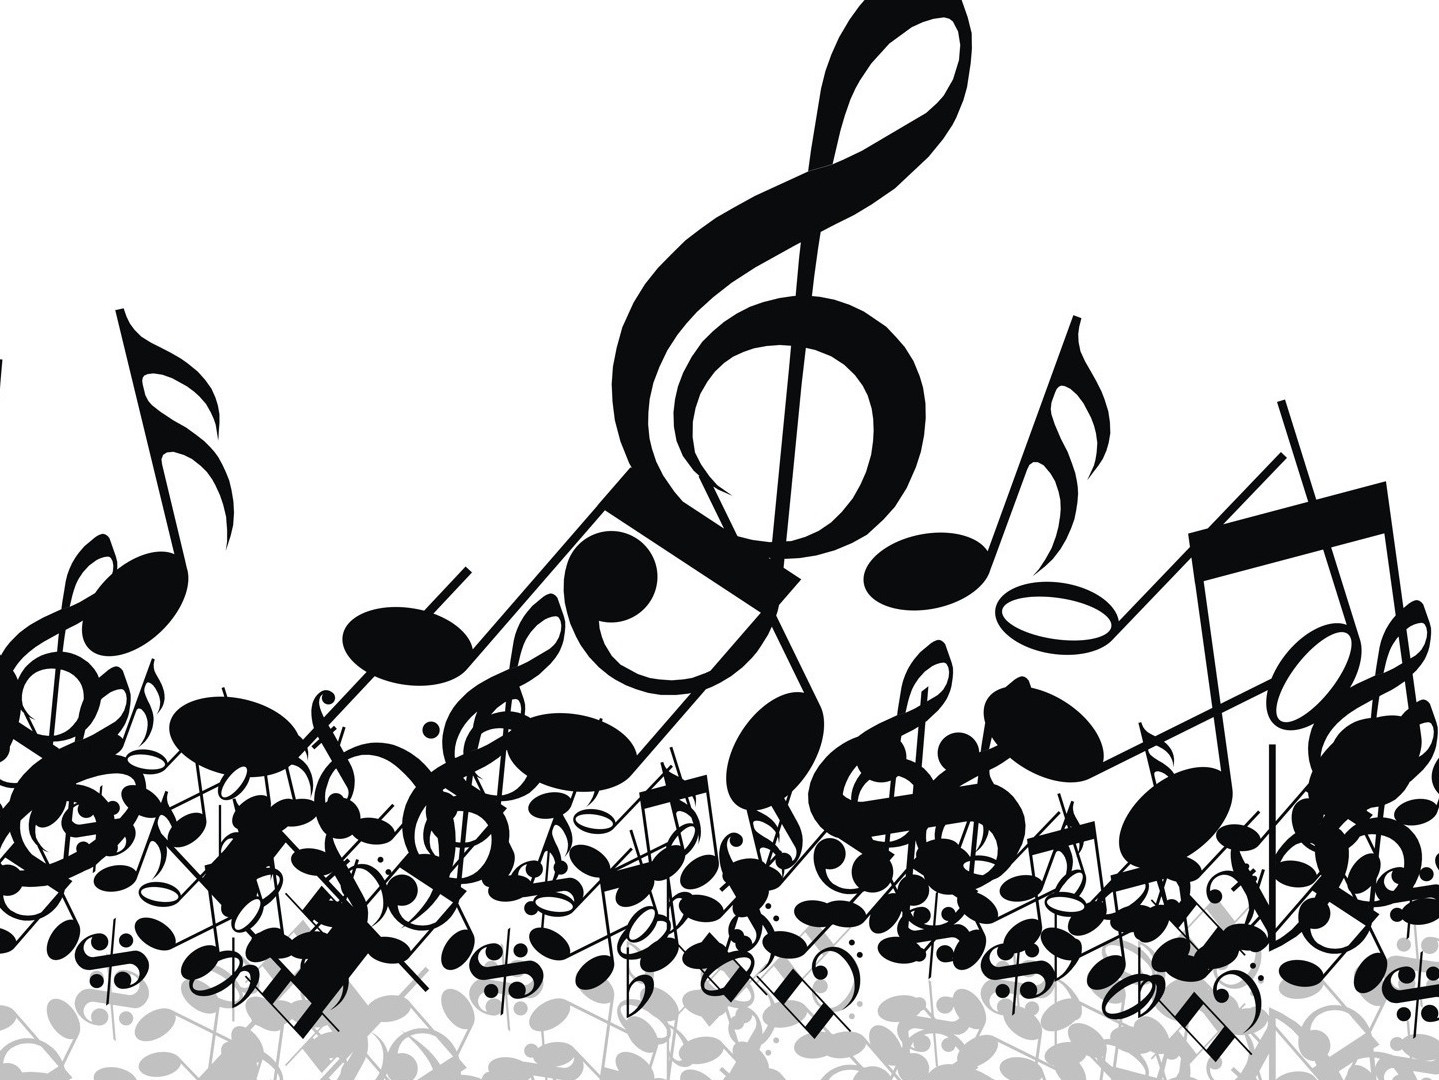 music-notes-15781-1920x1080.jpg